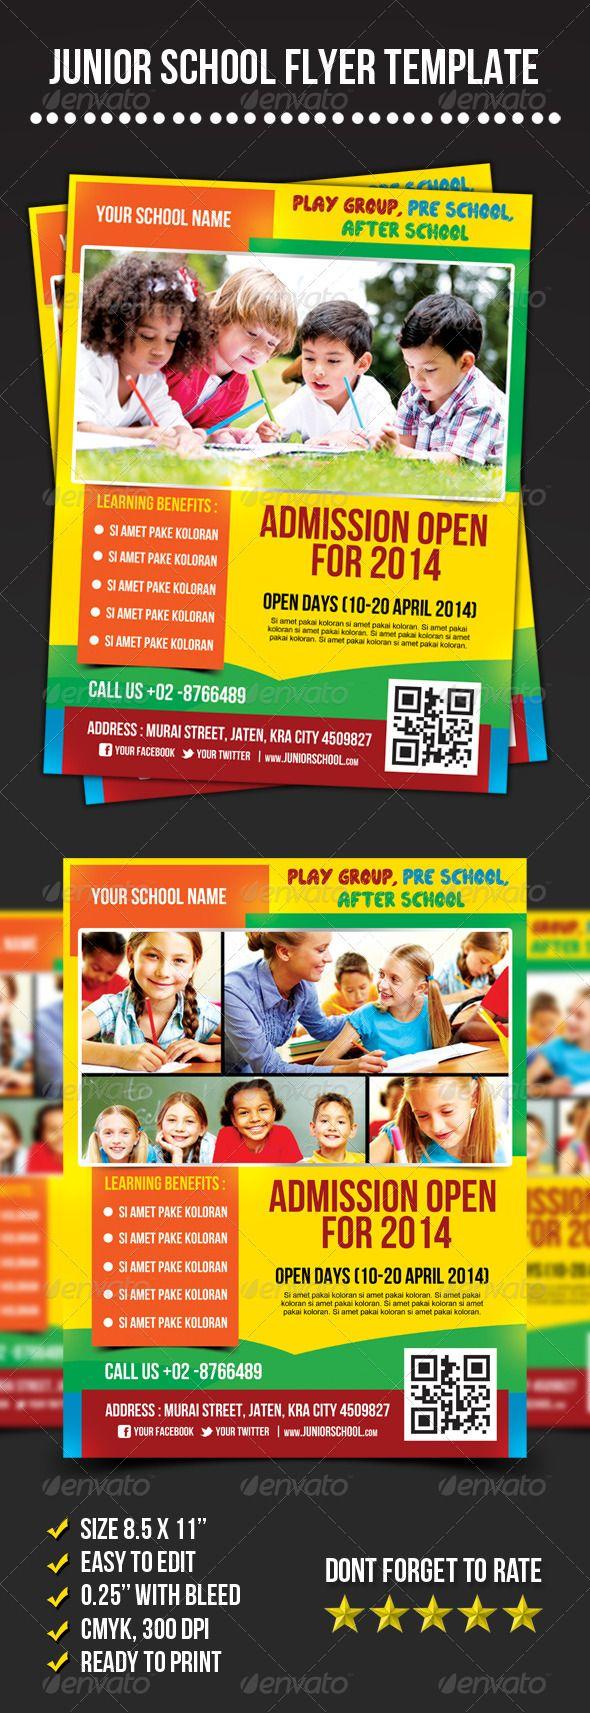 Junior School Flyer — Photoshop Psd #preschool #open Day • Available Here →  Https